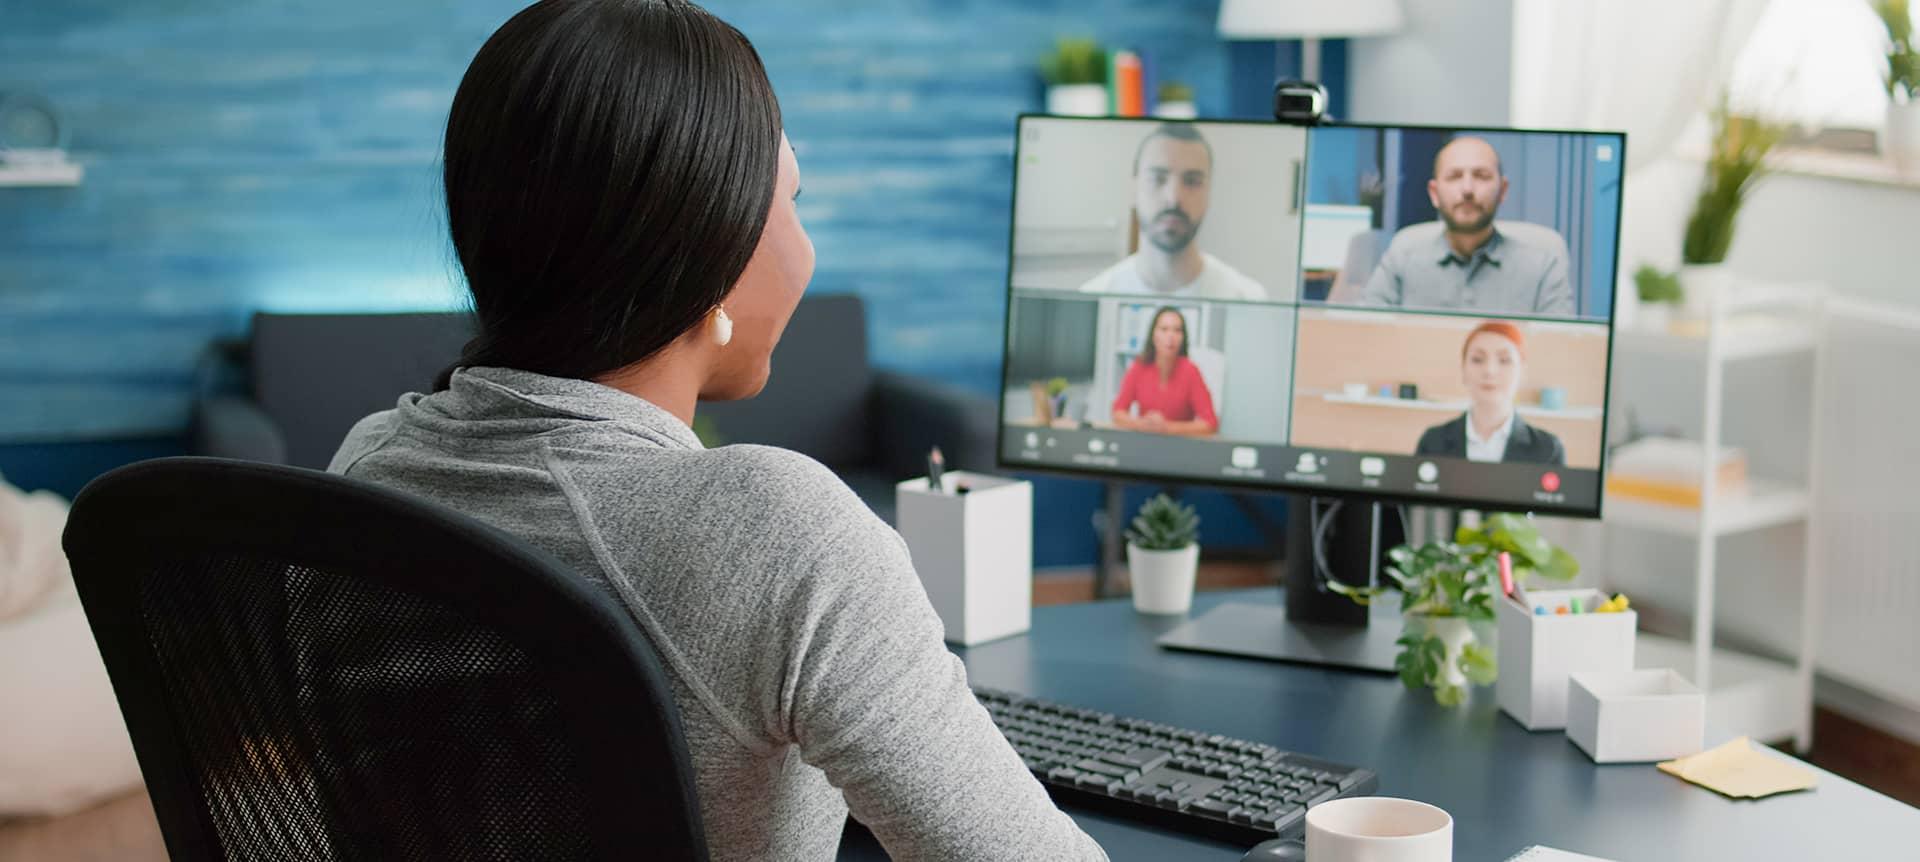 Recruiter conducting a video assessment interview